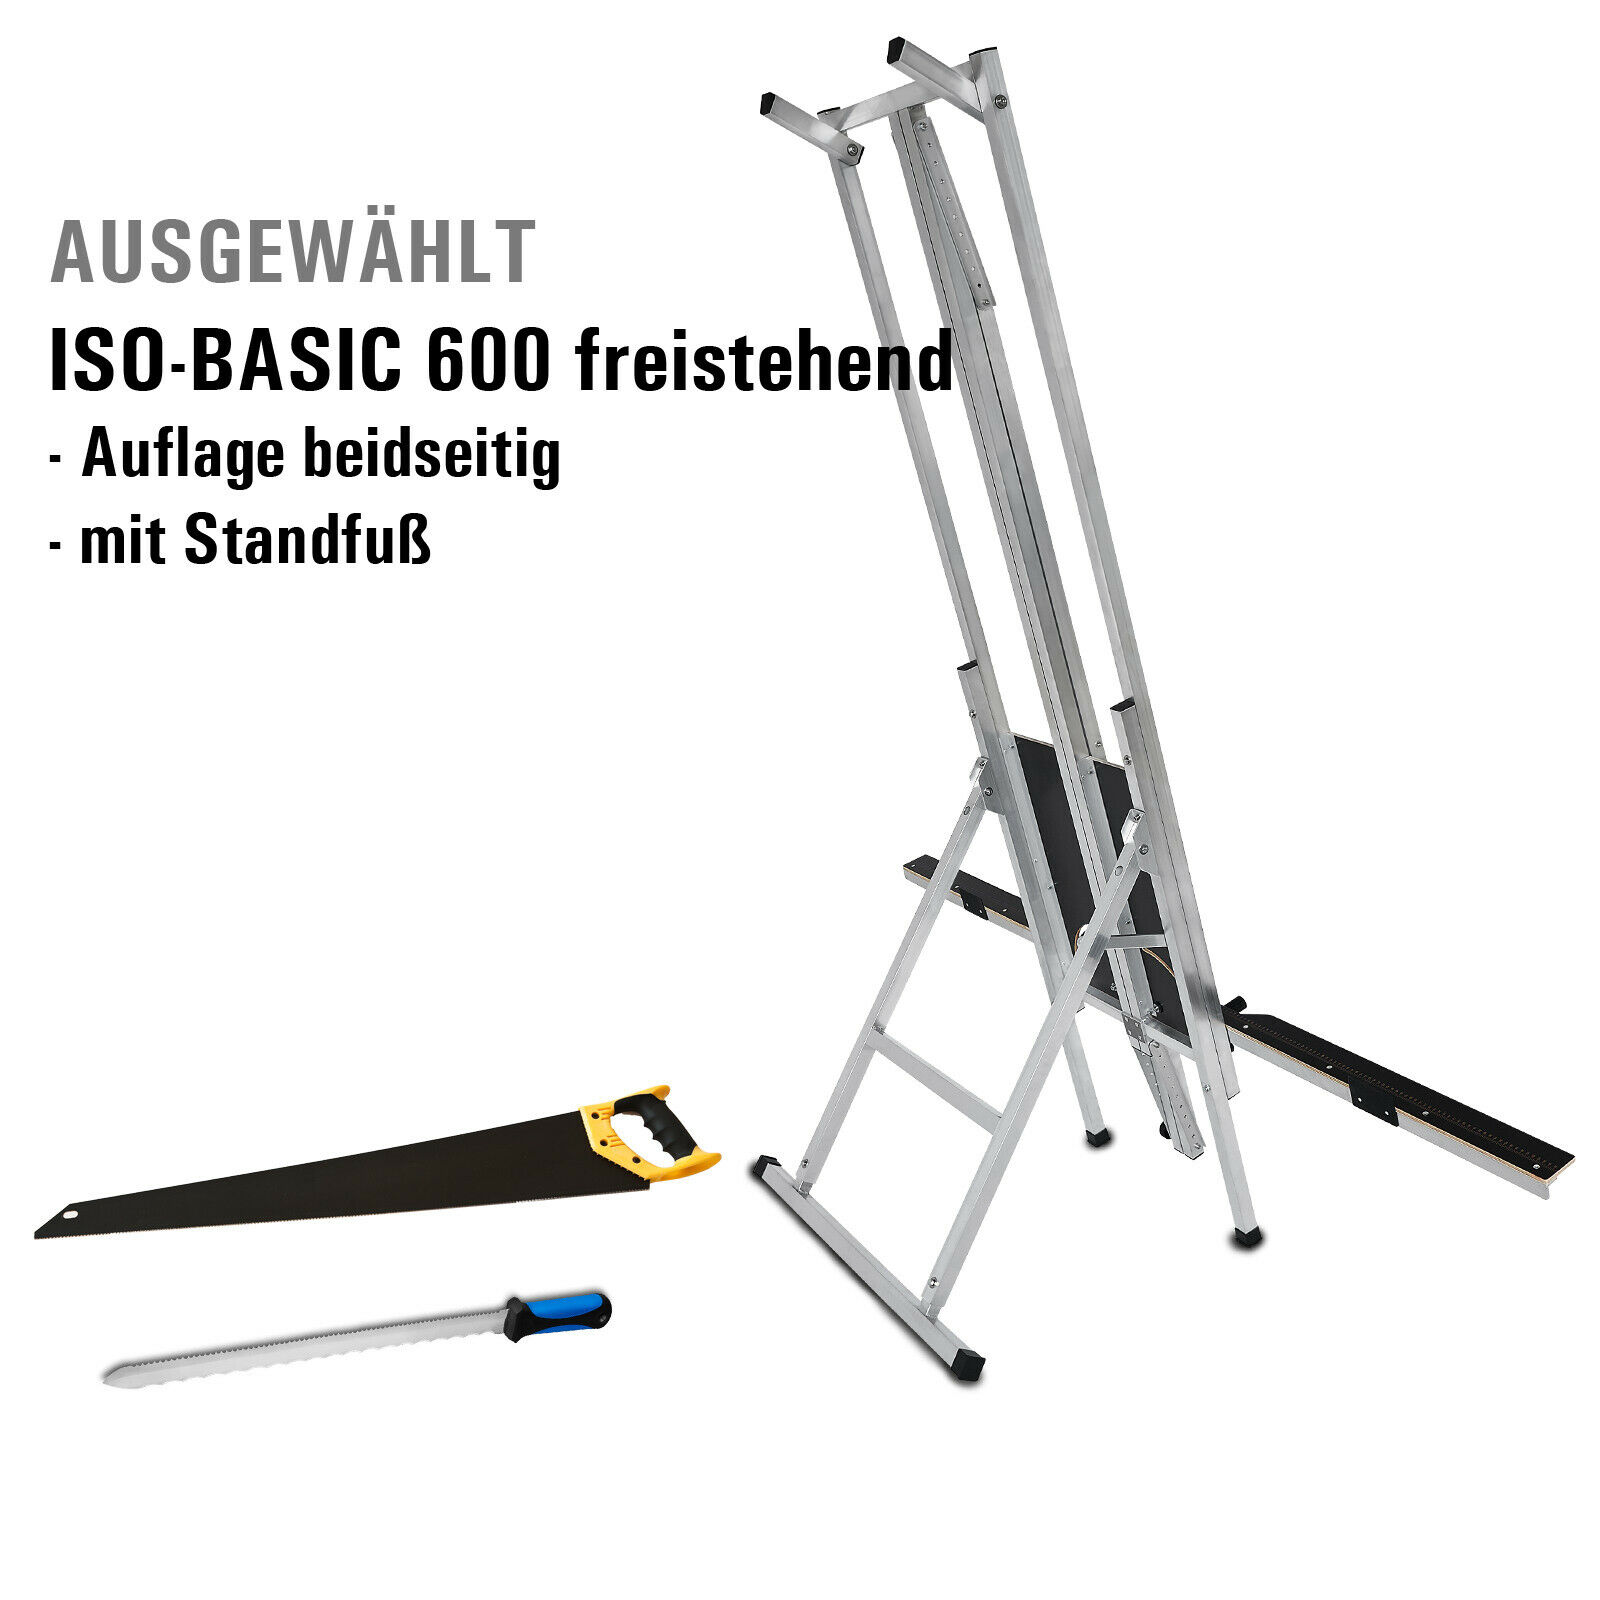 iso-basic-600-mit-standfuss-1DNuyk6Z41n7YG